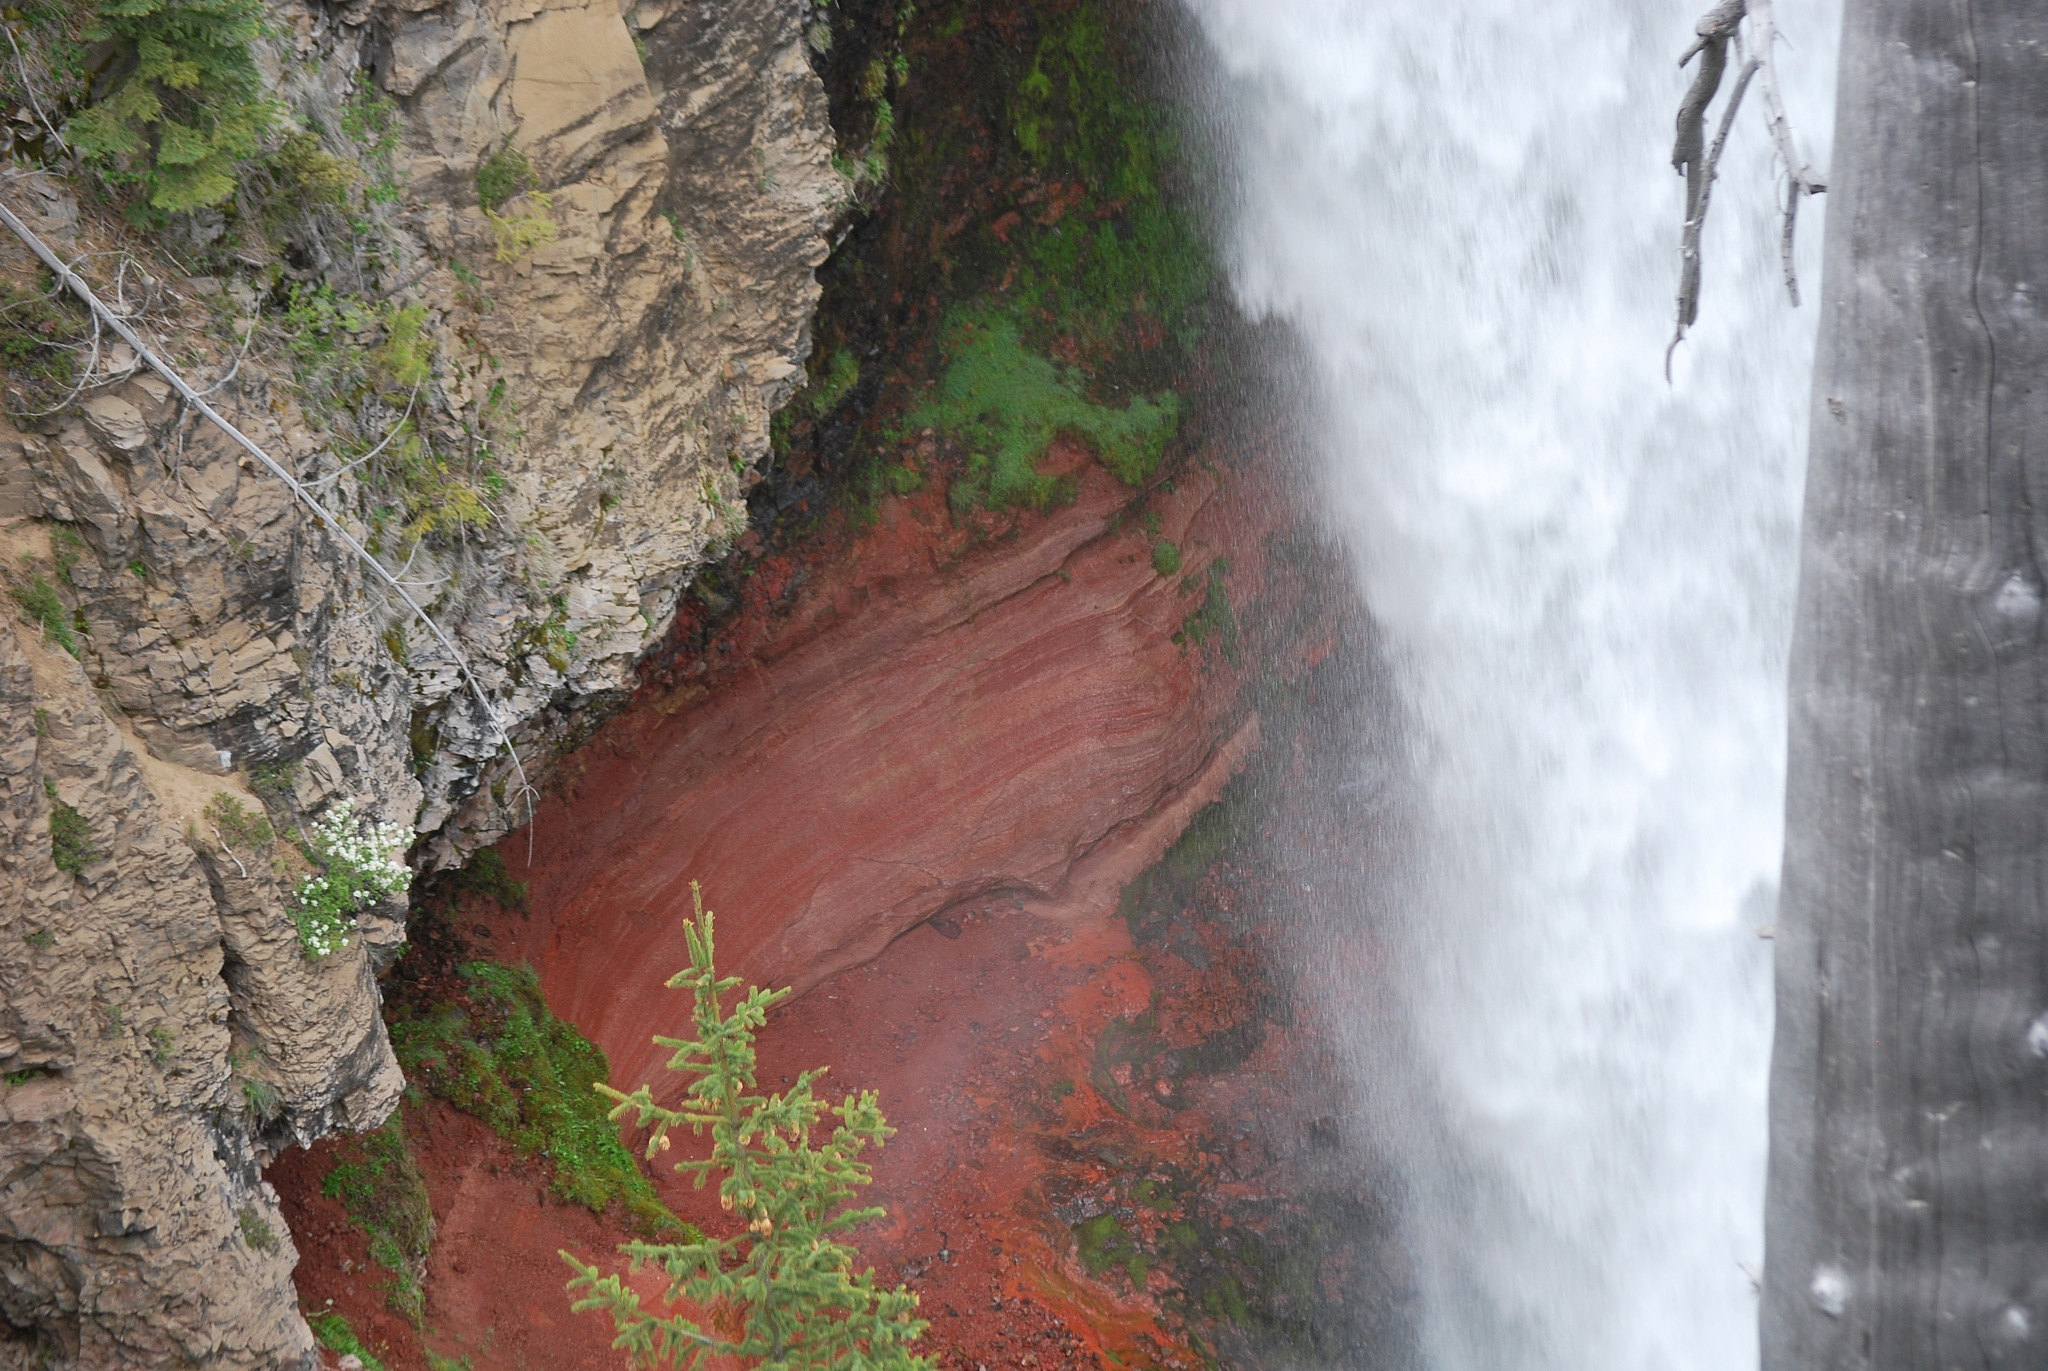 The sedimentary rock wall behind the falls by marilyn wirtz